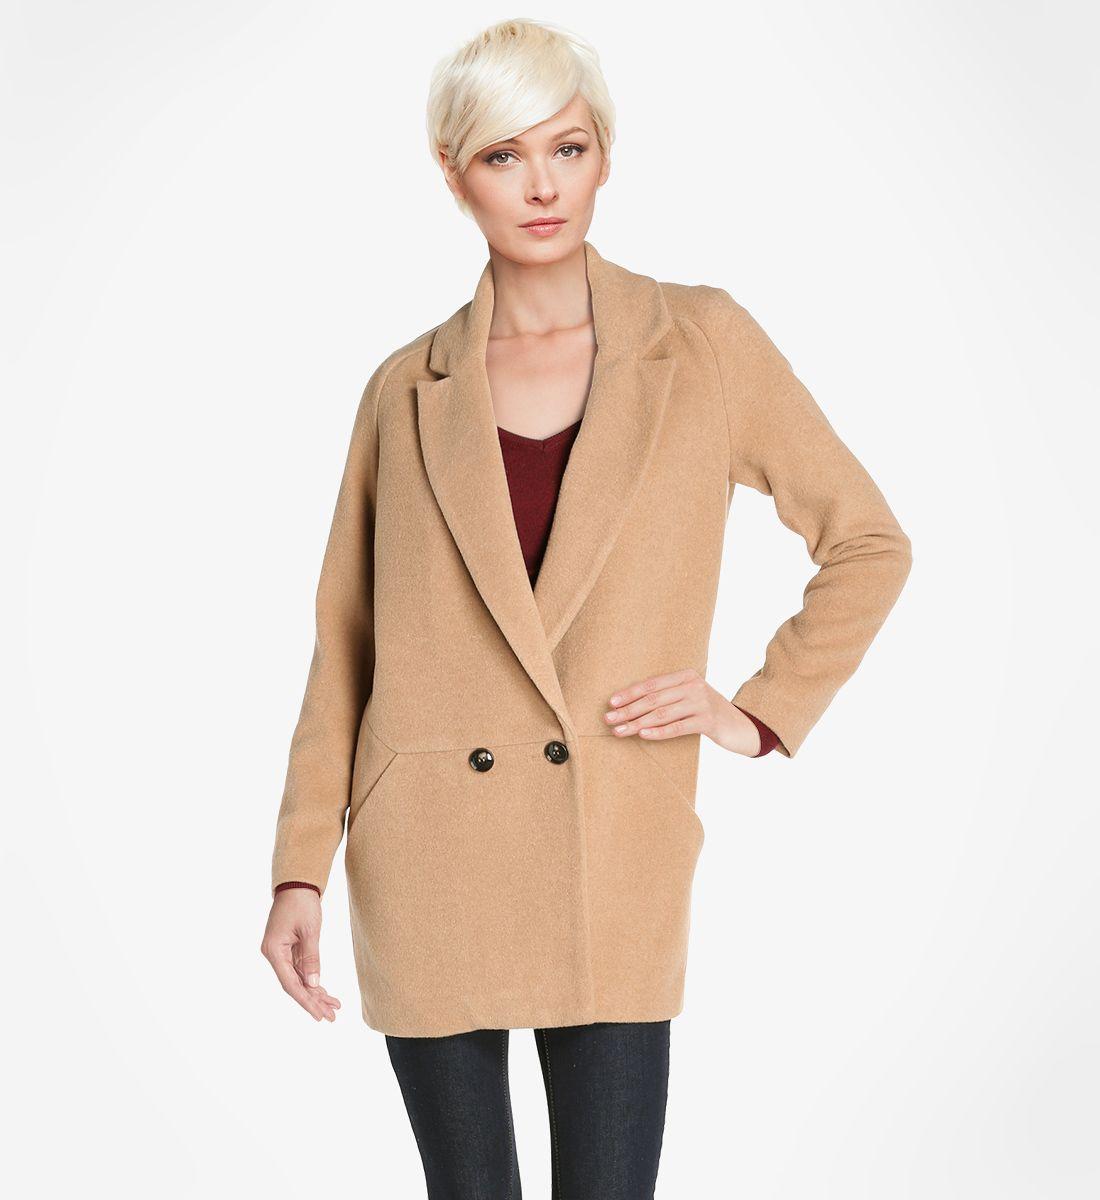 Manteau masculin See U Soon en camel pour femme - Galeries Lafayette 130